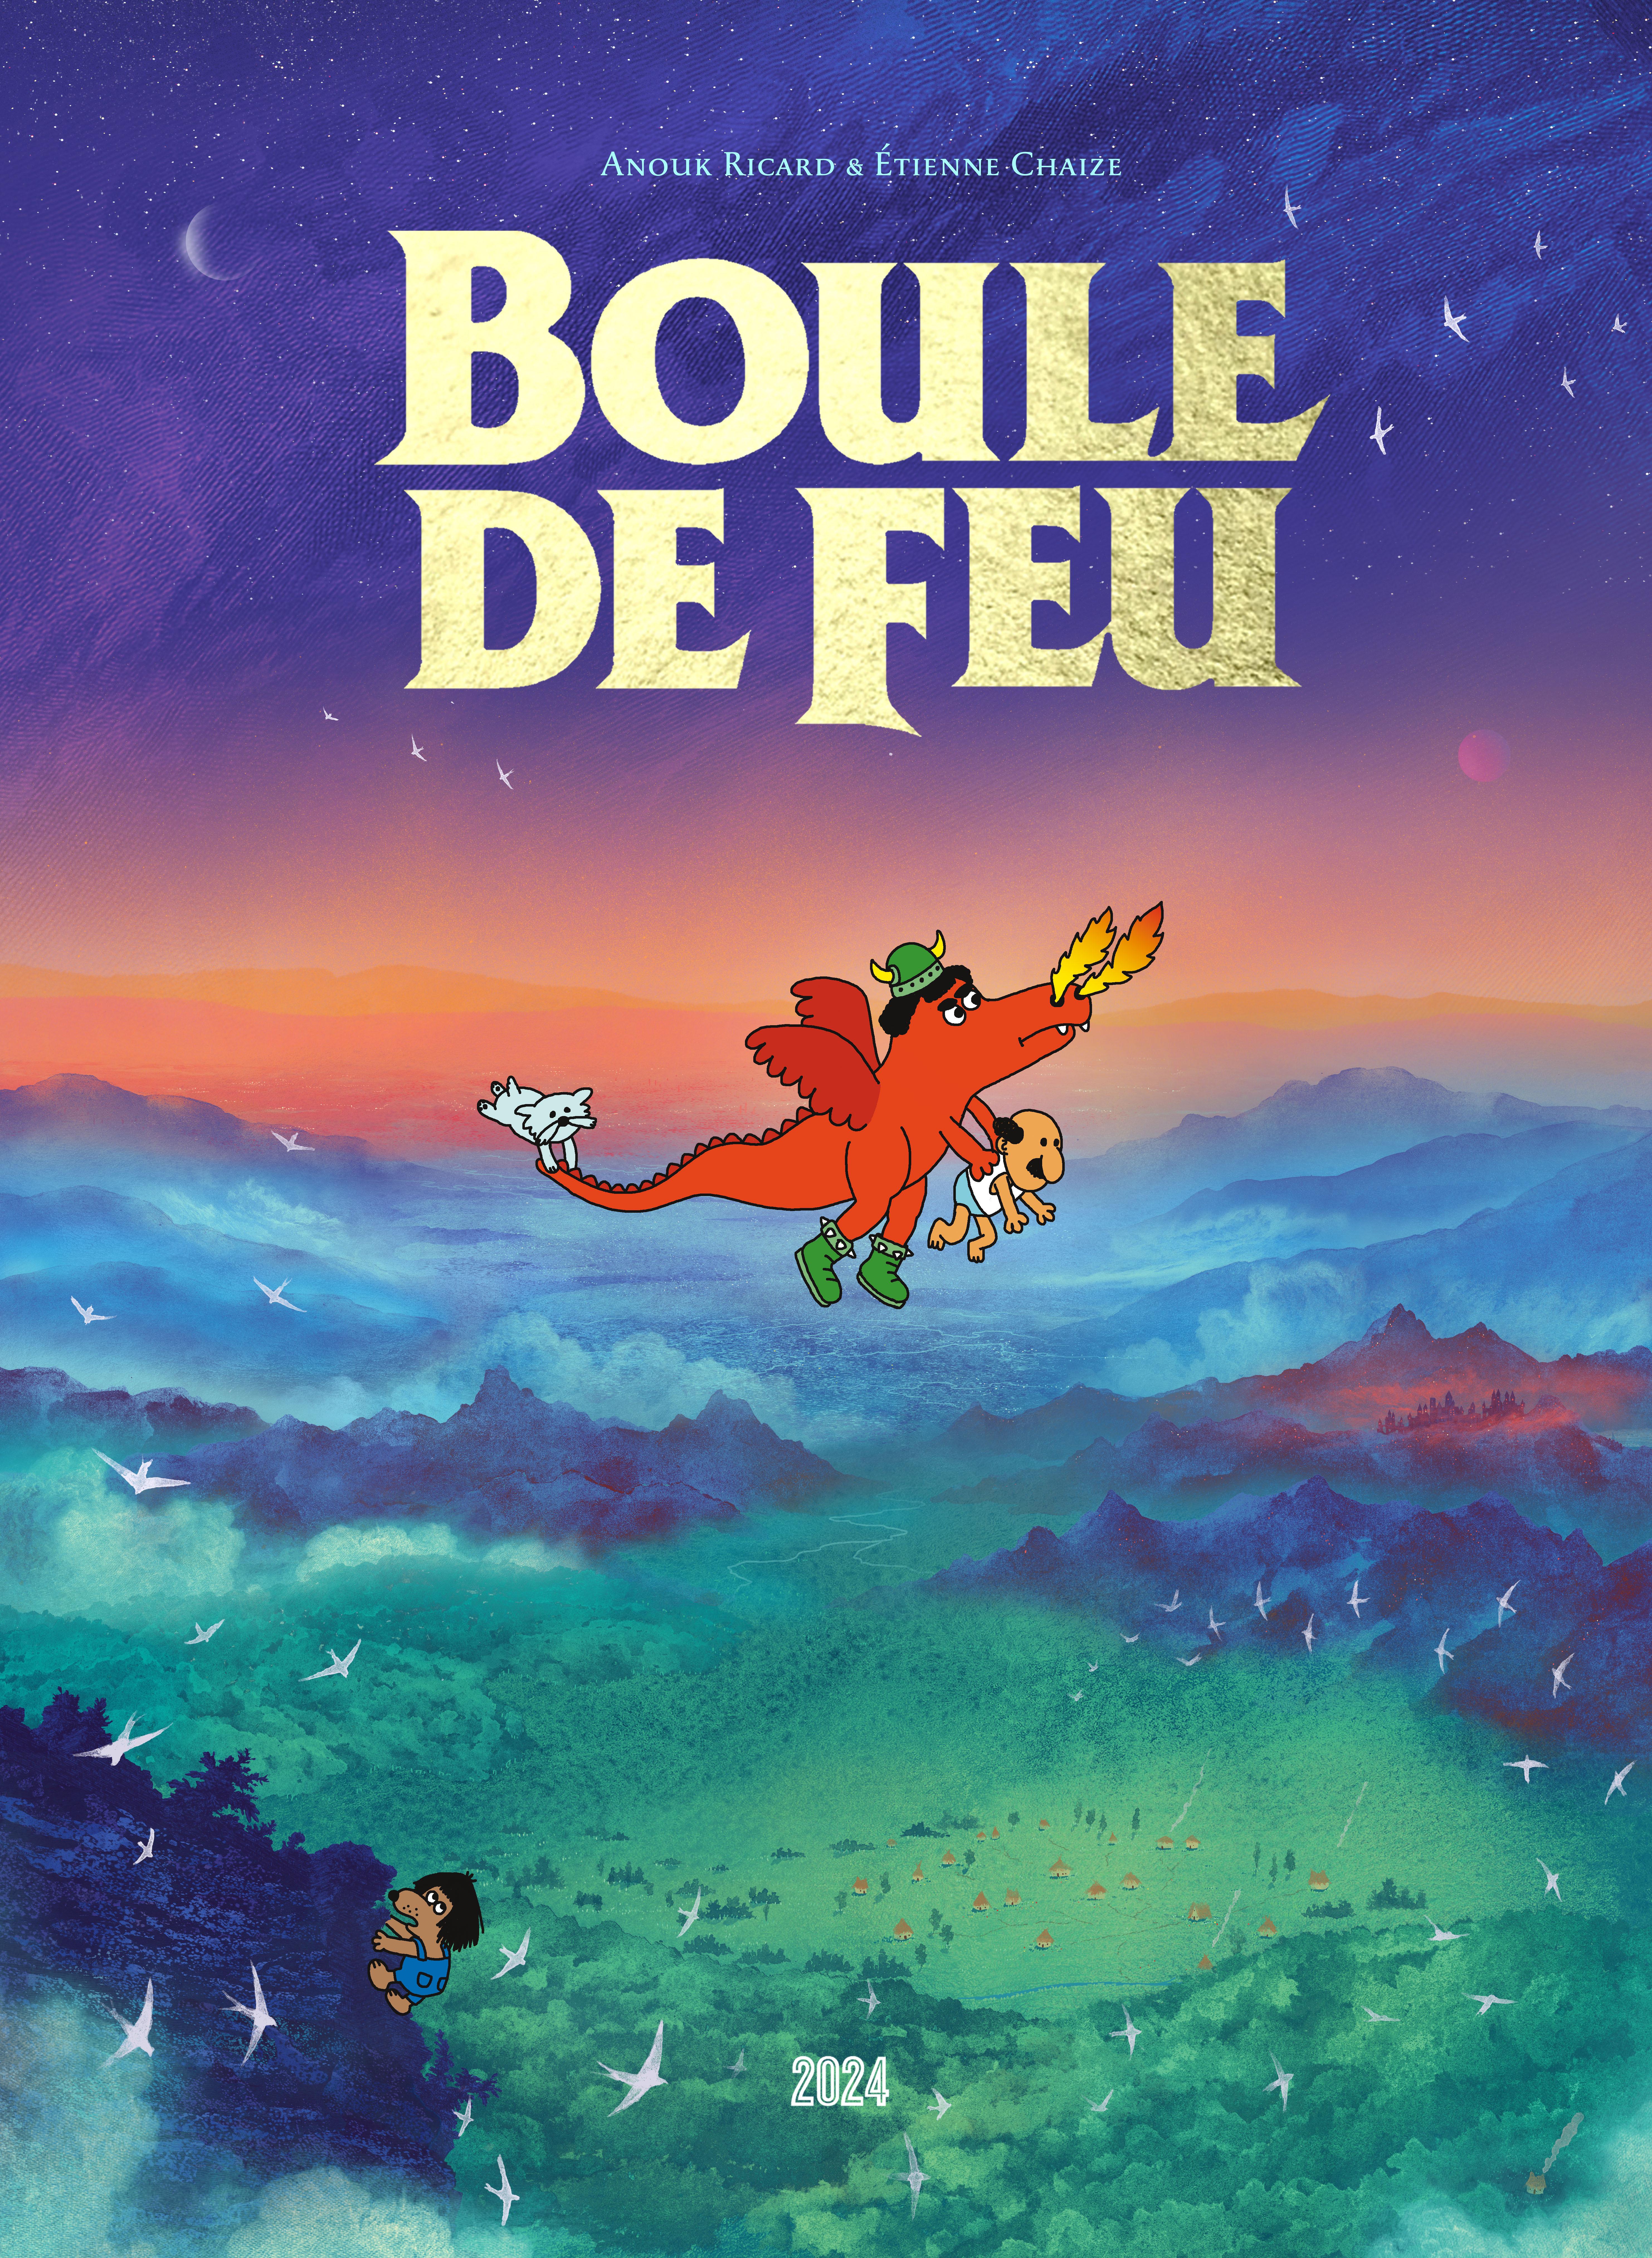 BOULE DE FEU